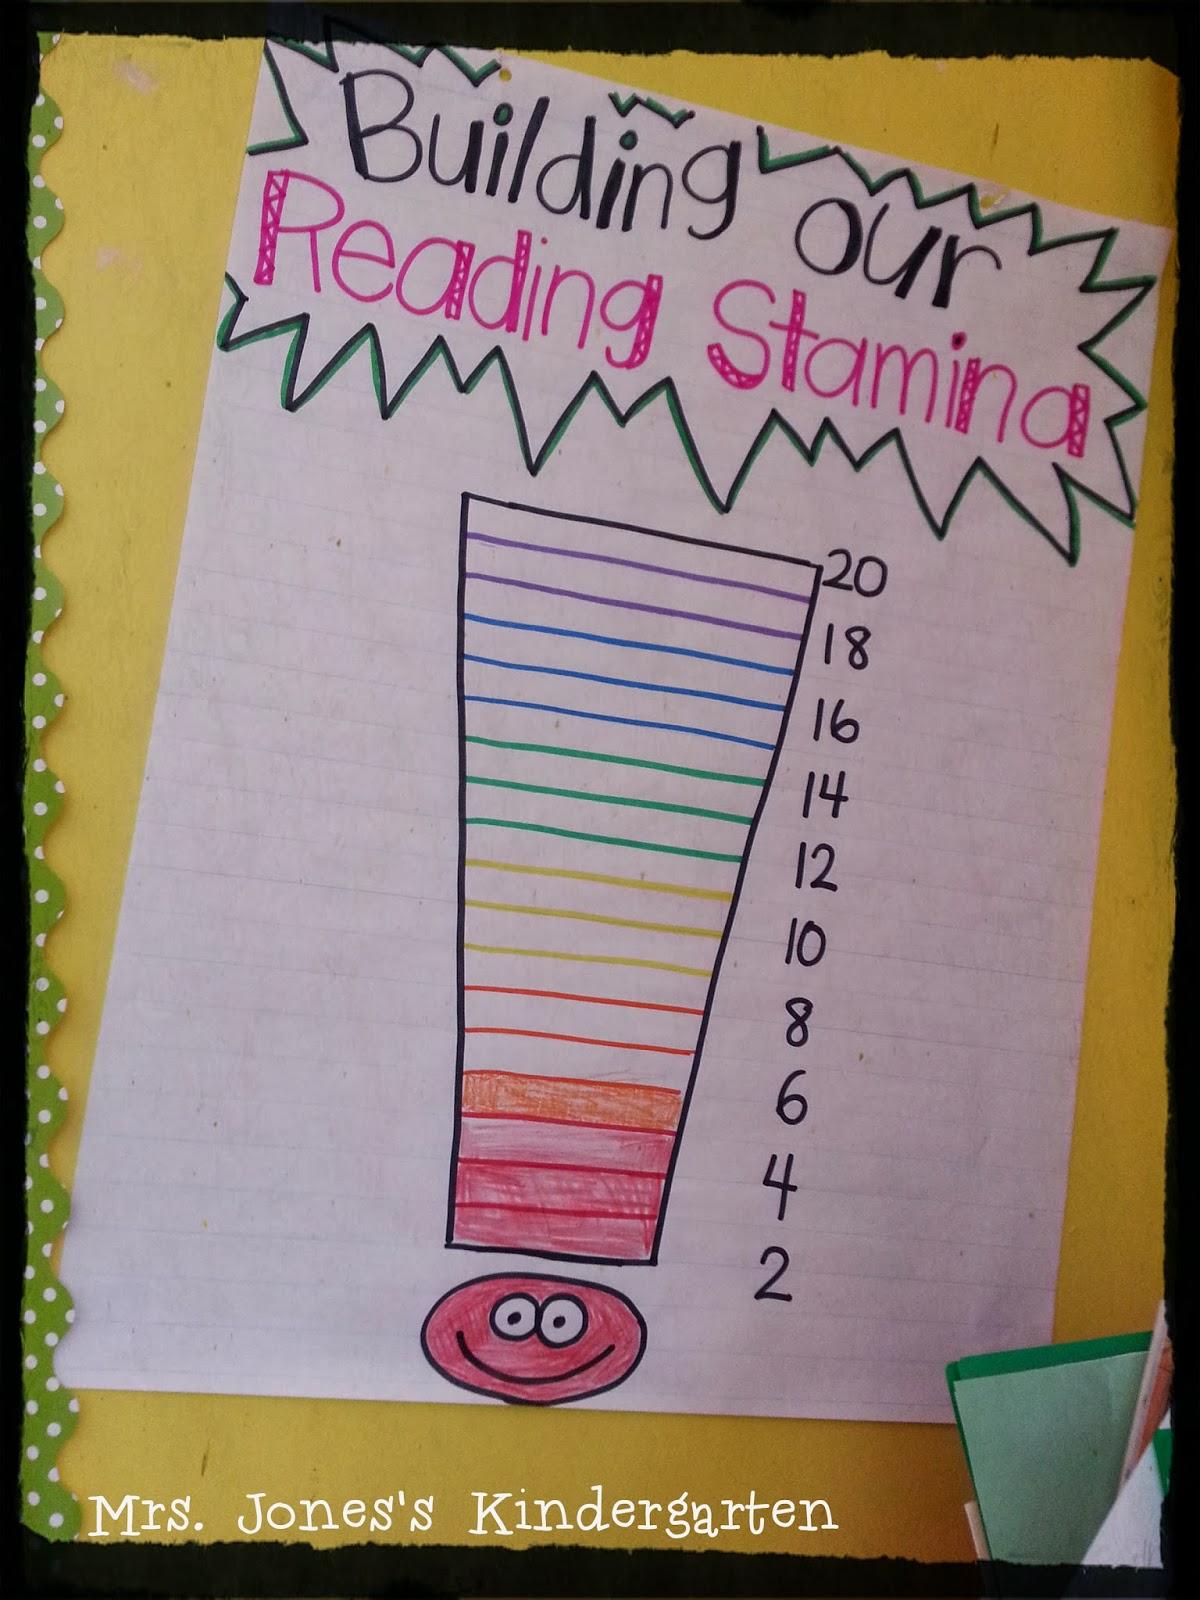 Kinder Garden: Building Reading Stamina In Kindergarten!